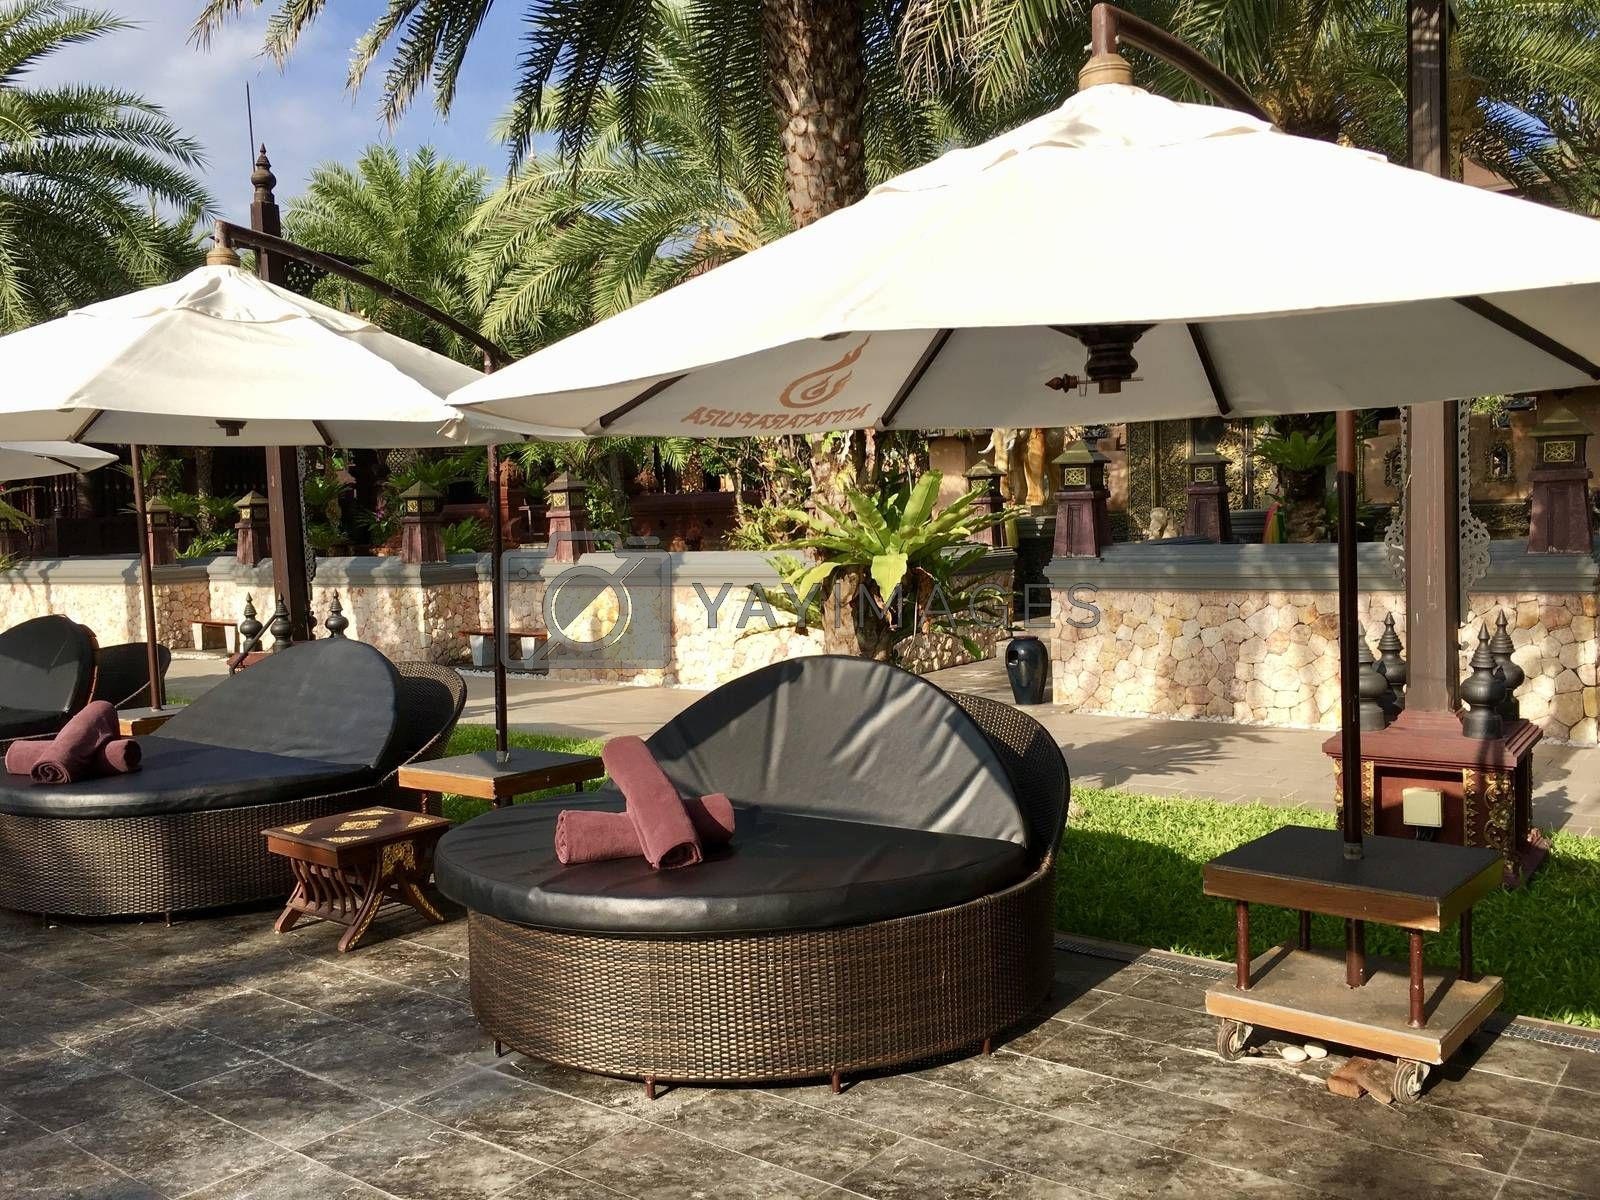 FEBRUARY 27, 2017: Ammatara Pura Pool Villa, Koh Samui, Thailand. Beautiful resort pool Swimming pool of luxury resort and spa near the sea. Beach chairs near swimming pool in tropical resort